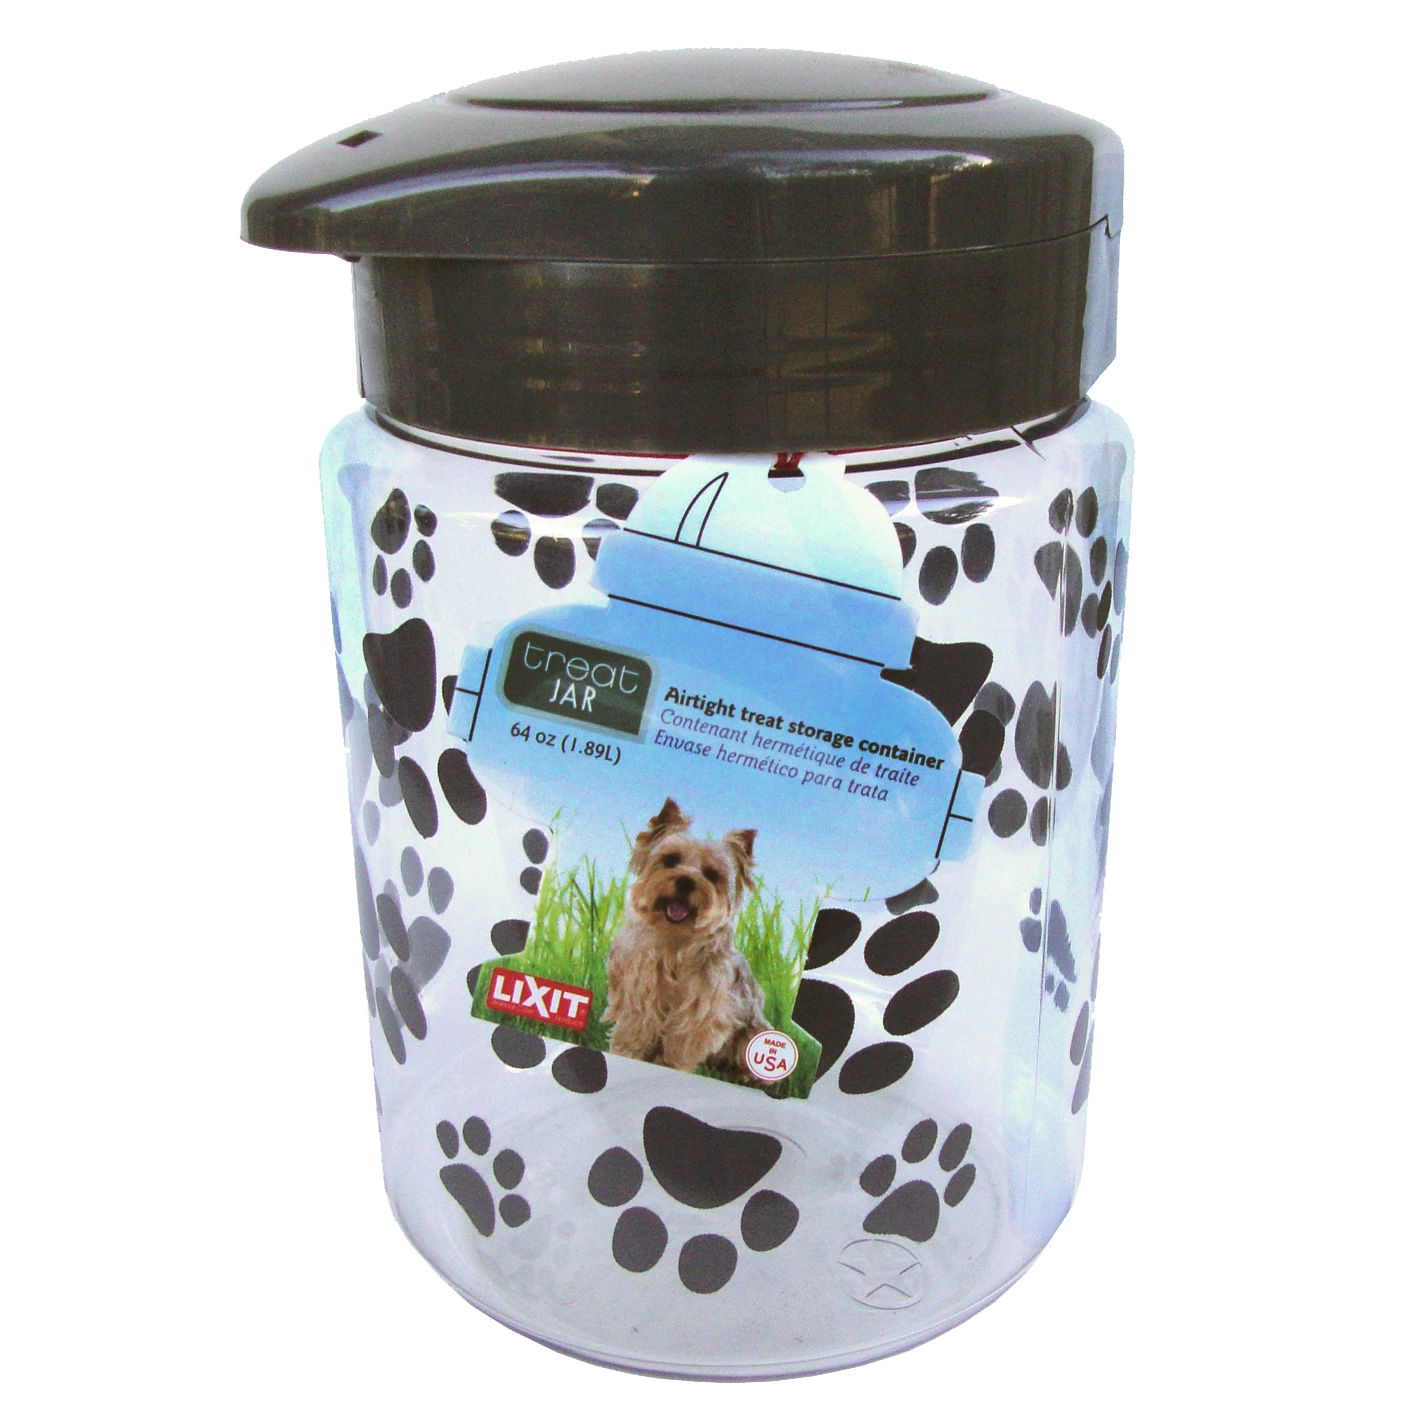 Lixit 128 Oz Dog Treat Jar Overstock 15221866